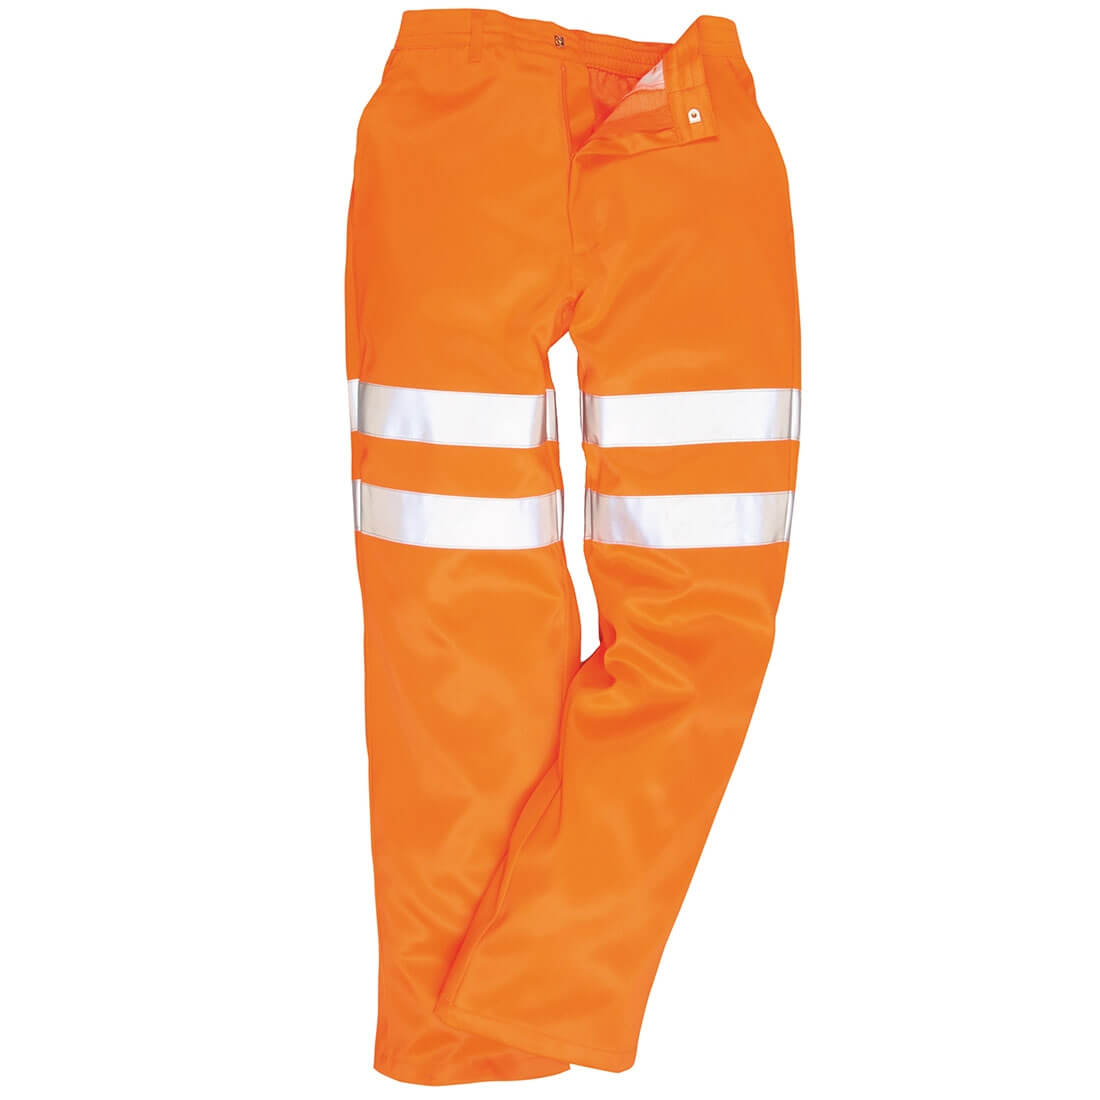 Pantaloni Poli Bumbac HiVis GO/RT - Imbracaminte de protectie